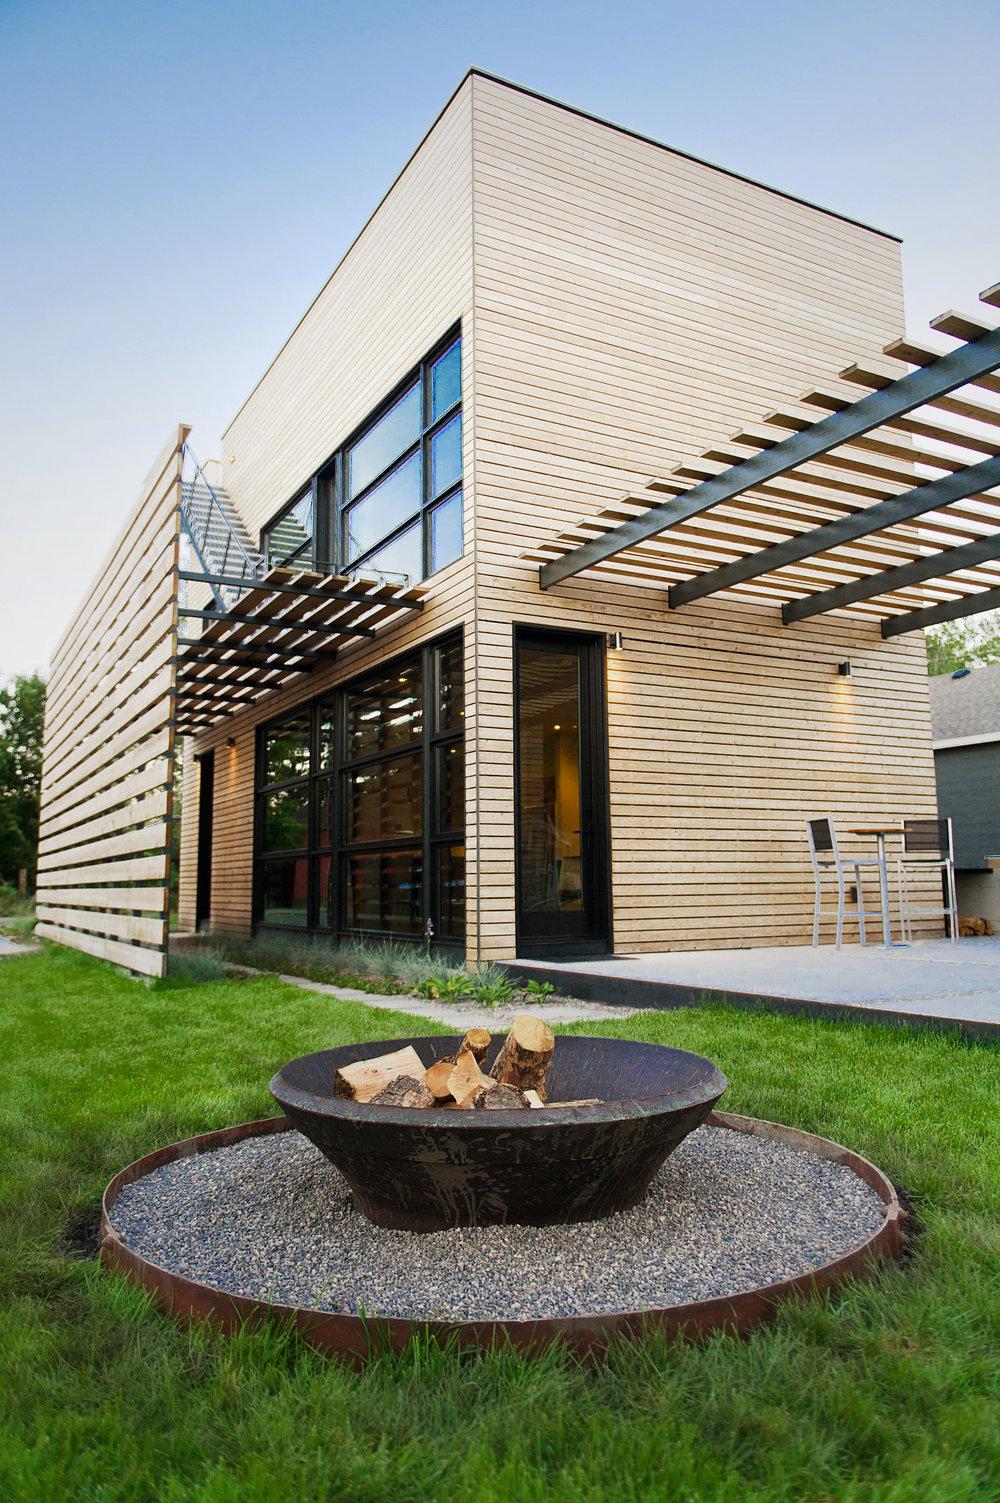 Woodworks-West-Bozeman-Montana-Builder-Cabinetry-Remodel-New-Construction-2796.jpg